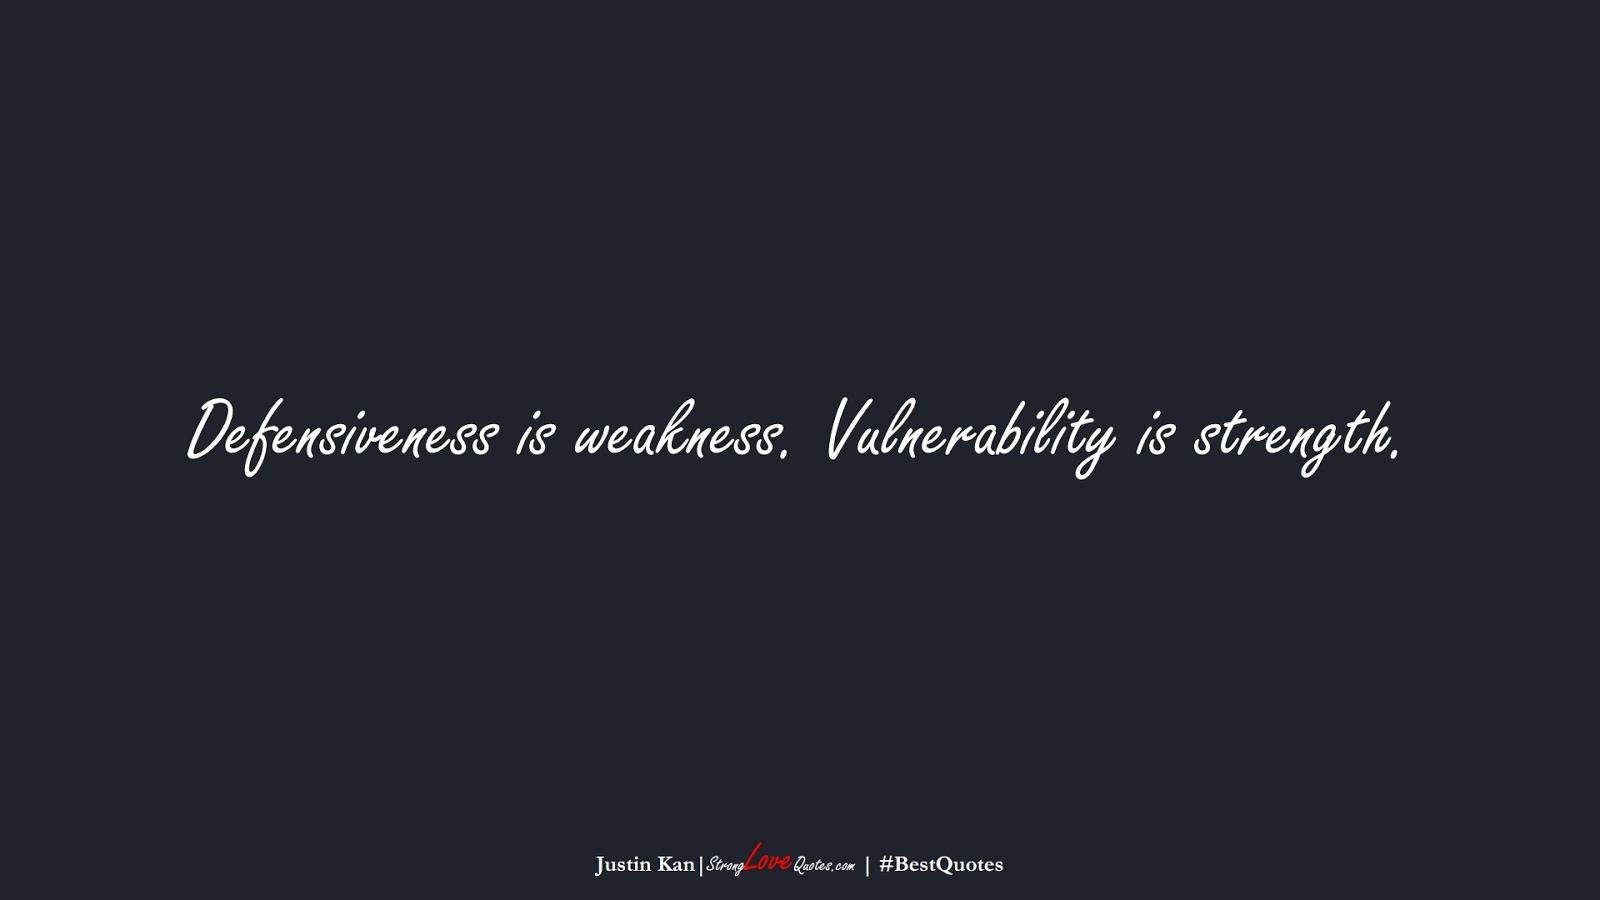 Defensiveness is weakness. Vulnerability is strength. (Justin Kan);  #BestQuotes